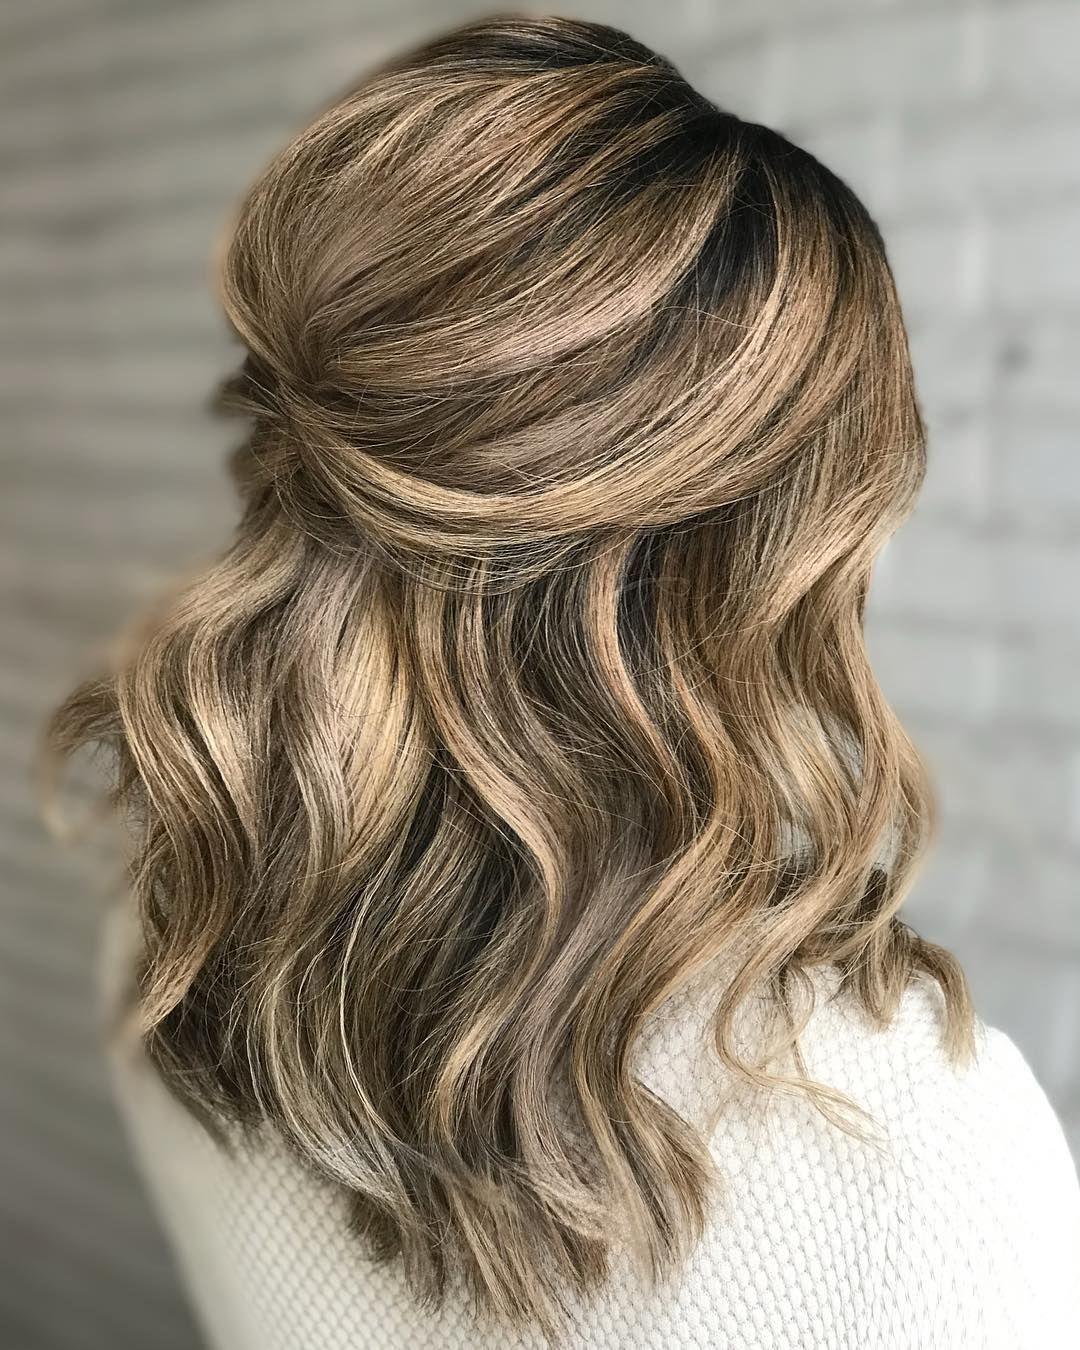 Kasia Fortuna On Instagram Half Up Style Hair Created During Bridal Hairstyling Course Kristinagasperasacademy Tutor Ka Hair Styles Hair Long Hair Styles